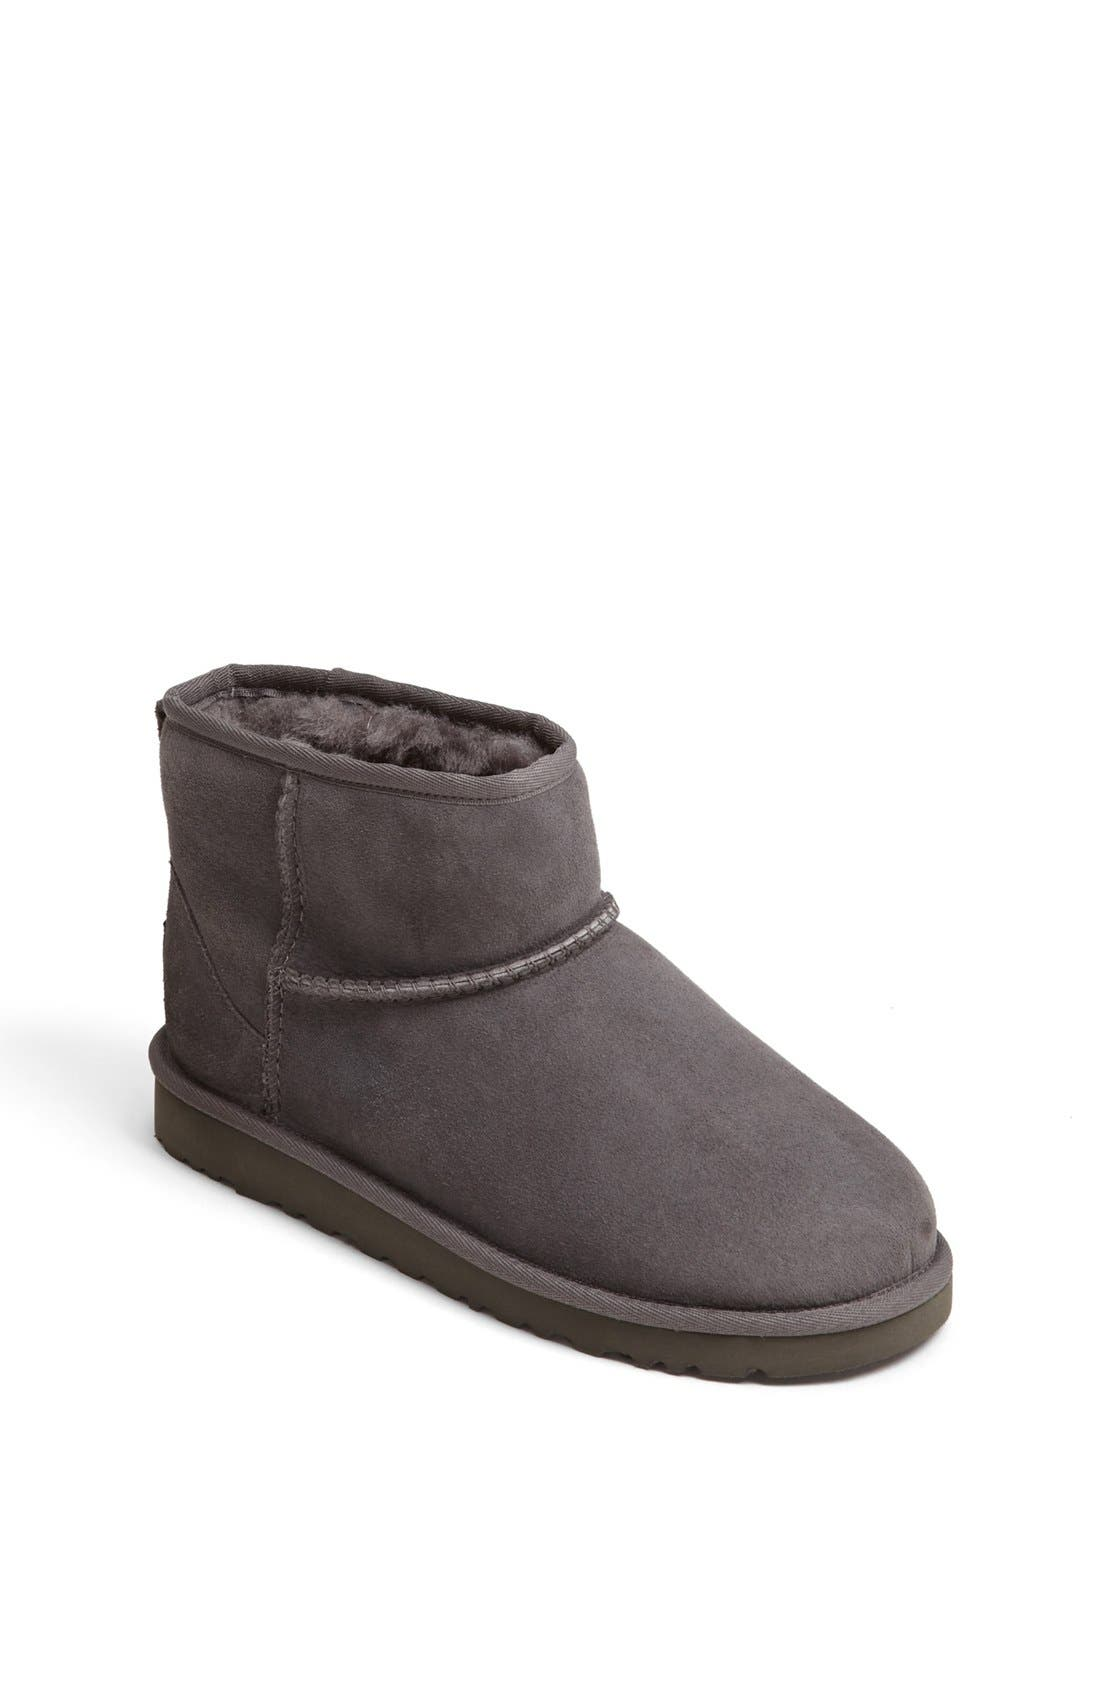 Main Image - UGG® 'Classic Mini' Boot (Walker, Toddler & Big Kid)